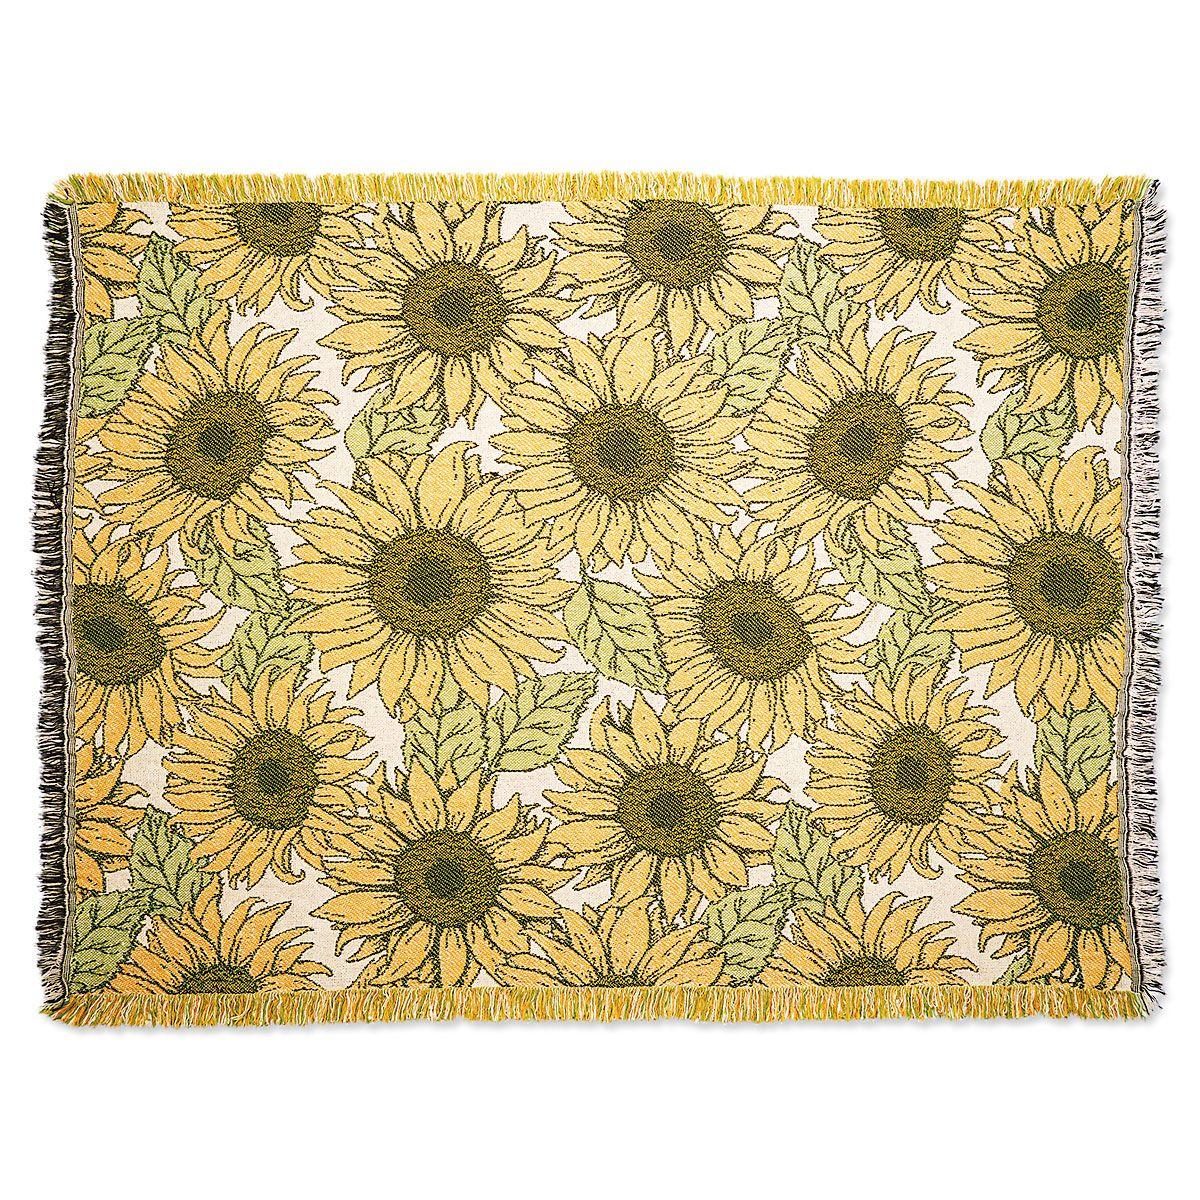 Sunflower Throw